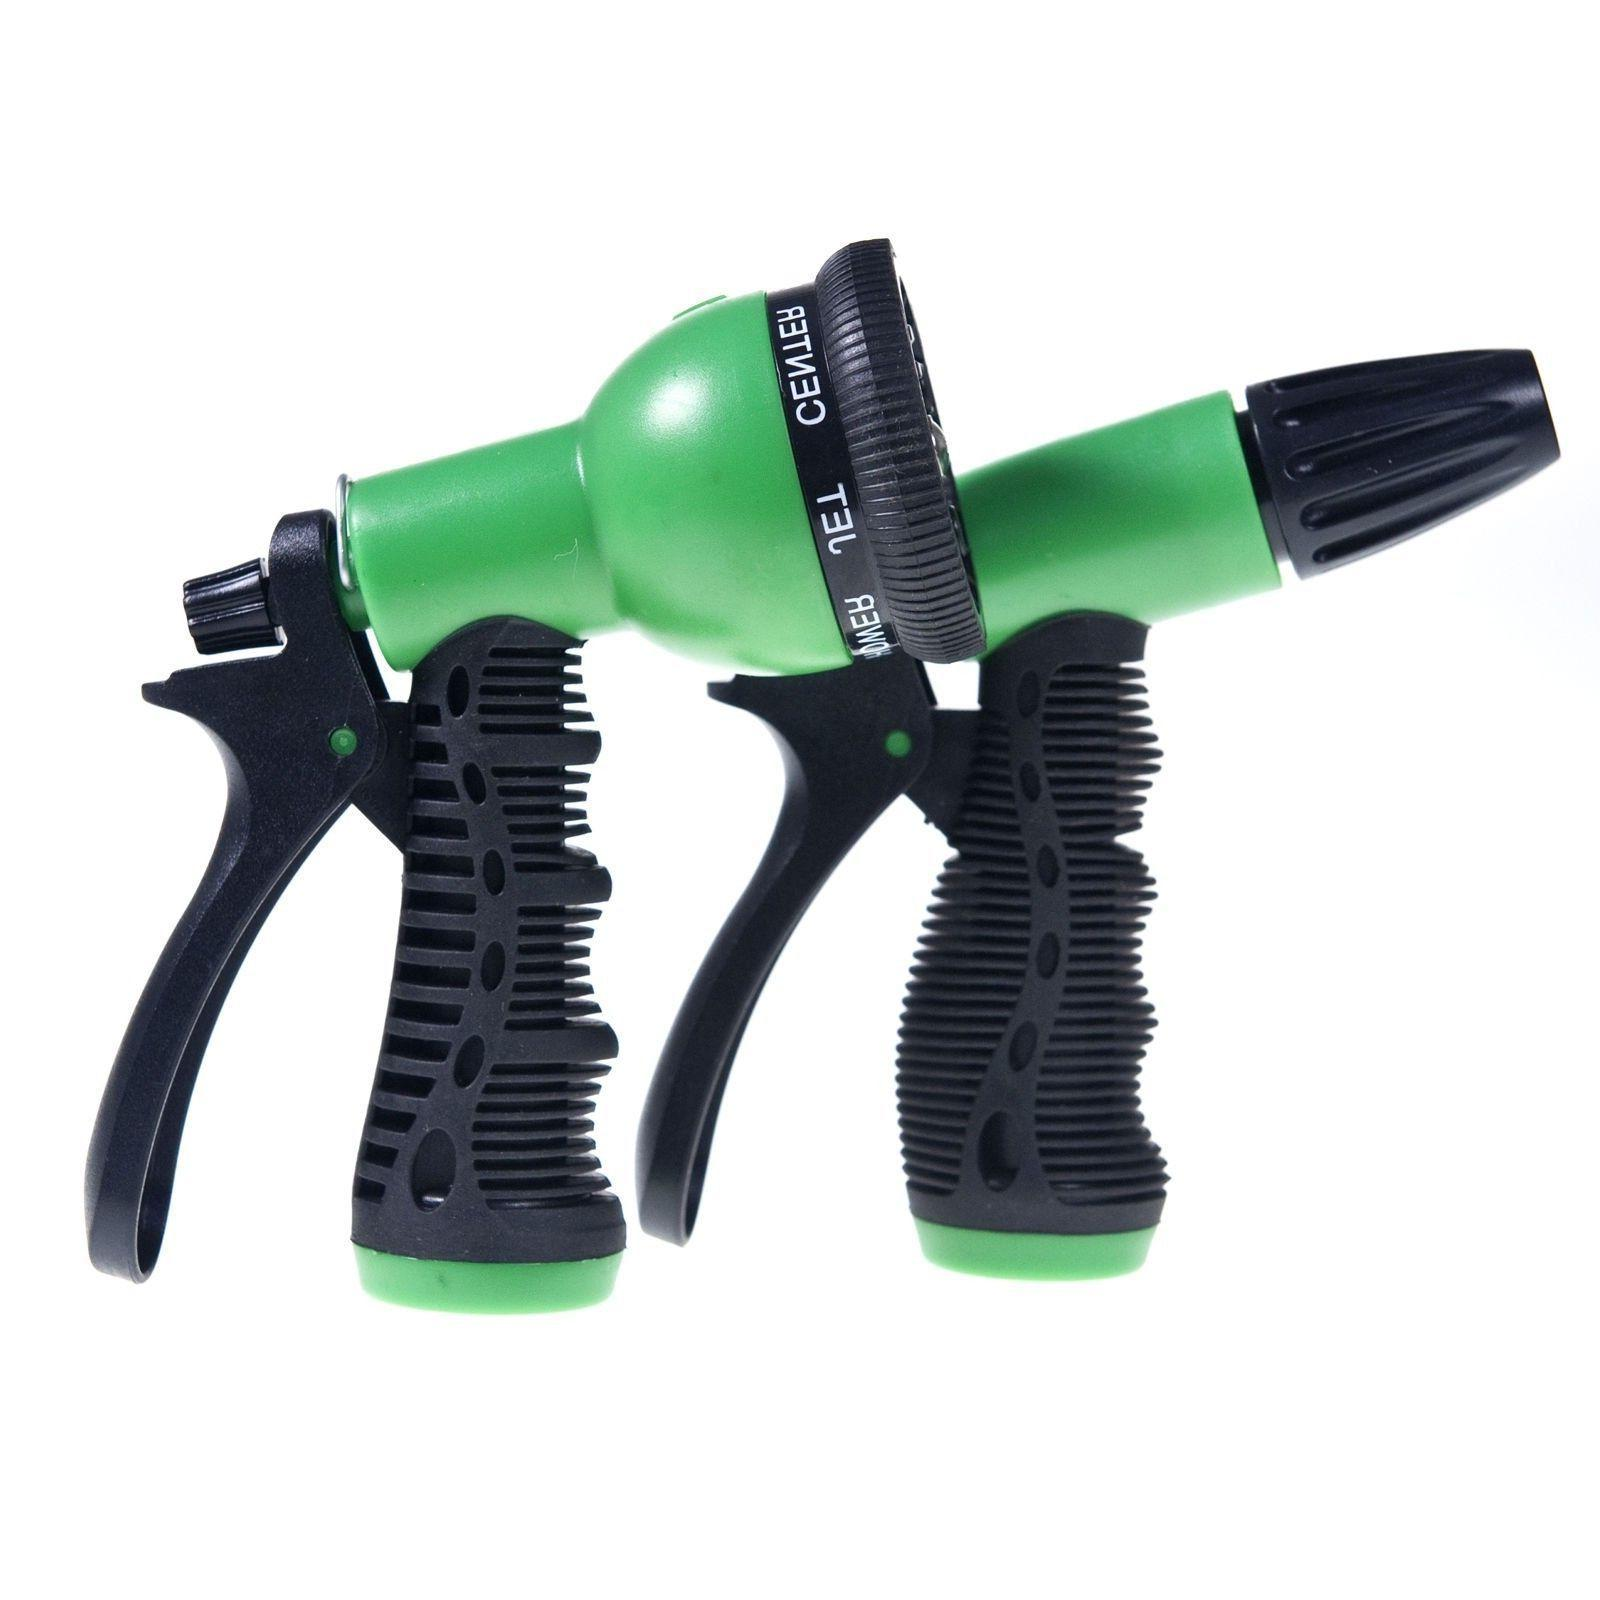 2 pack garden hose nozzle water sprayer